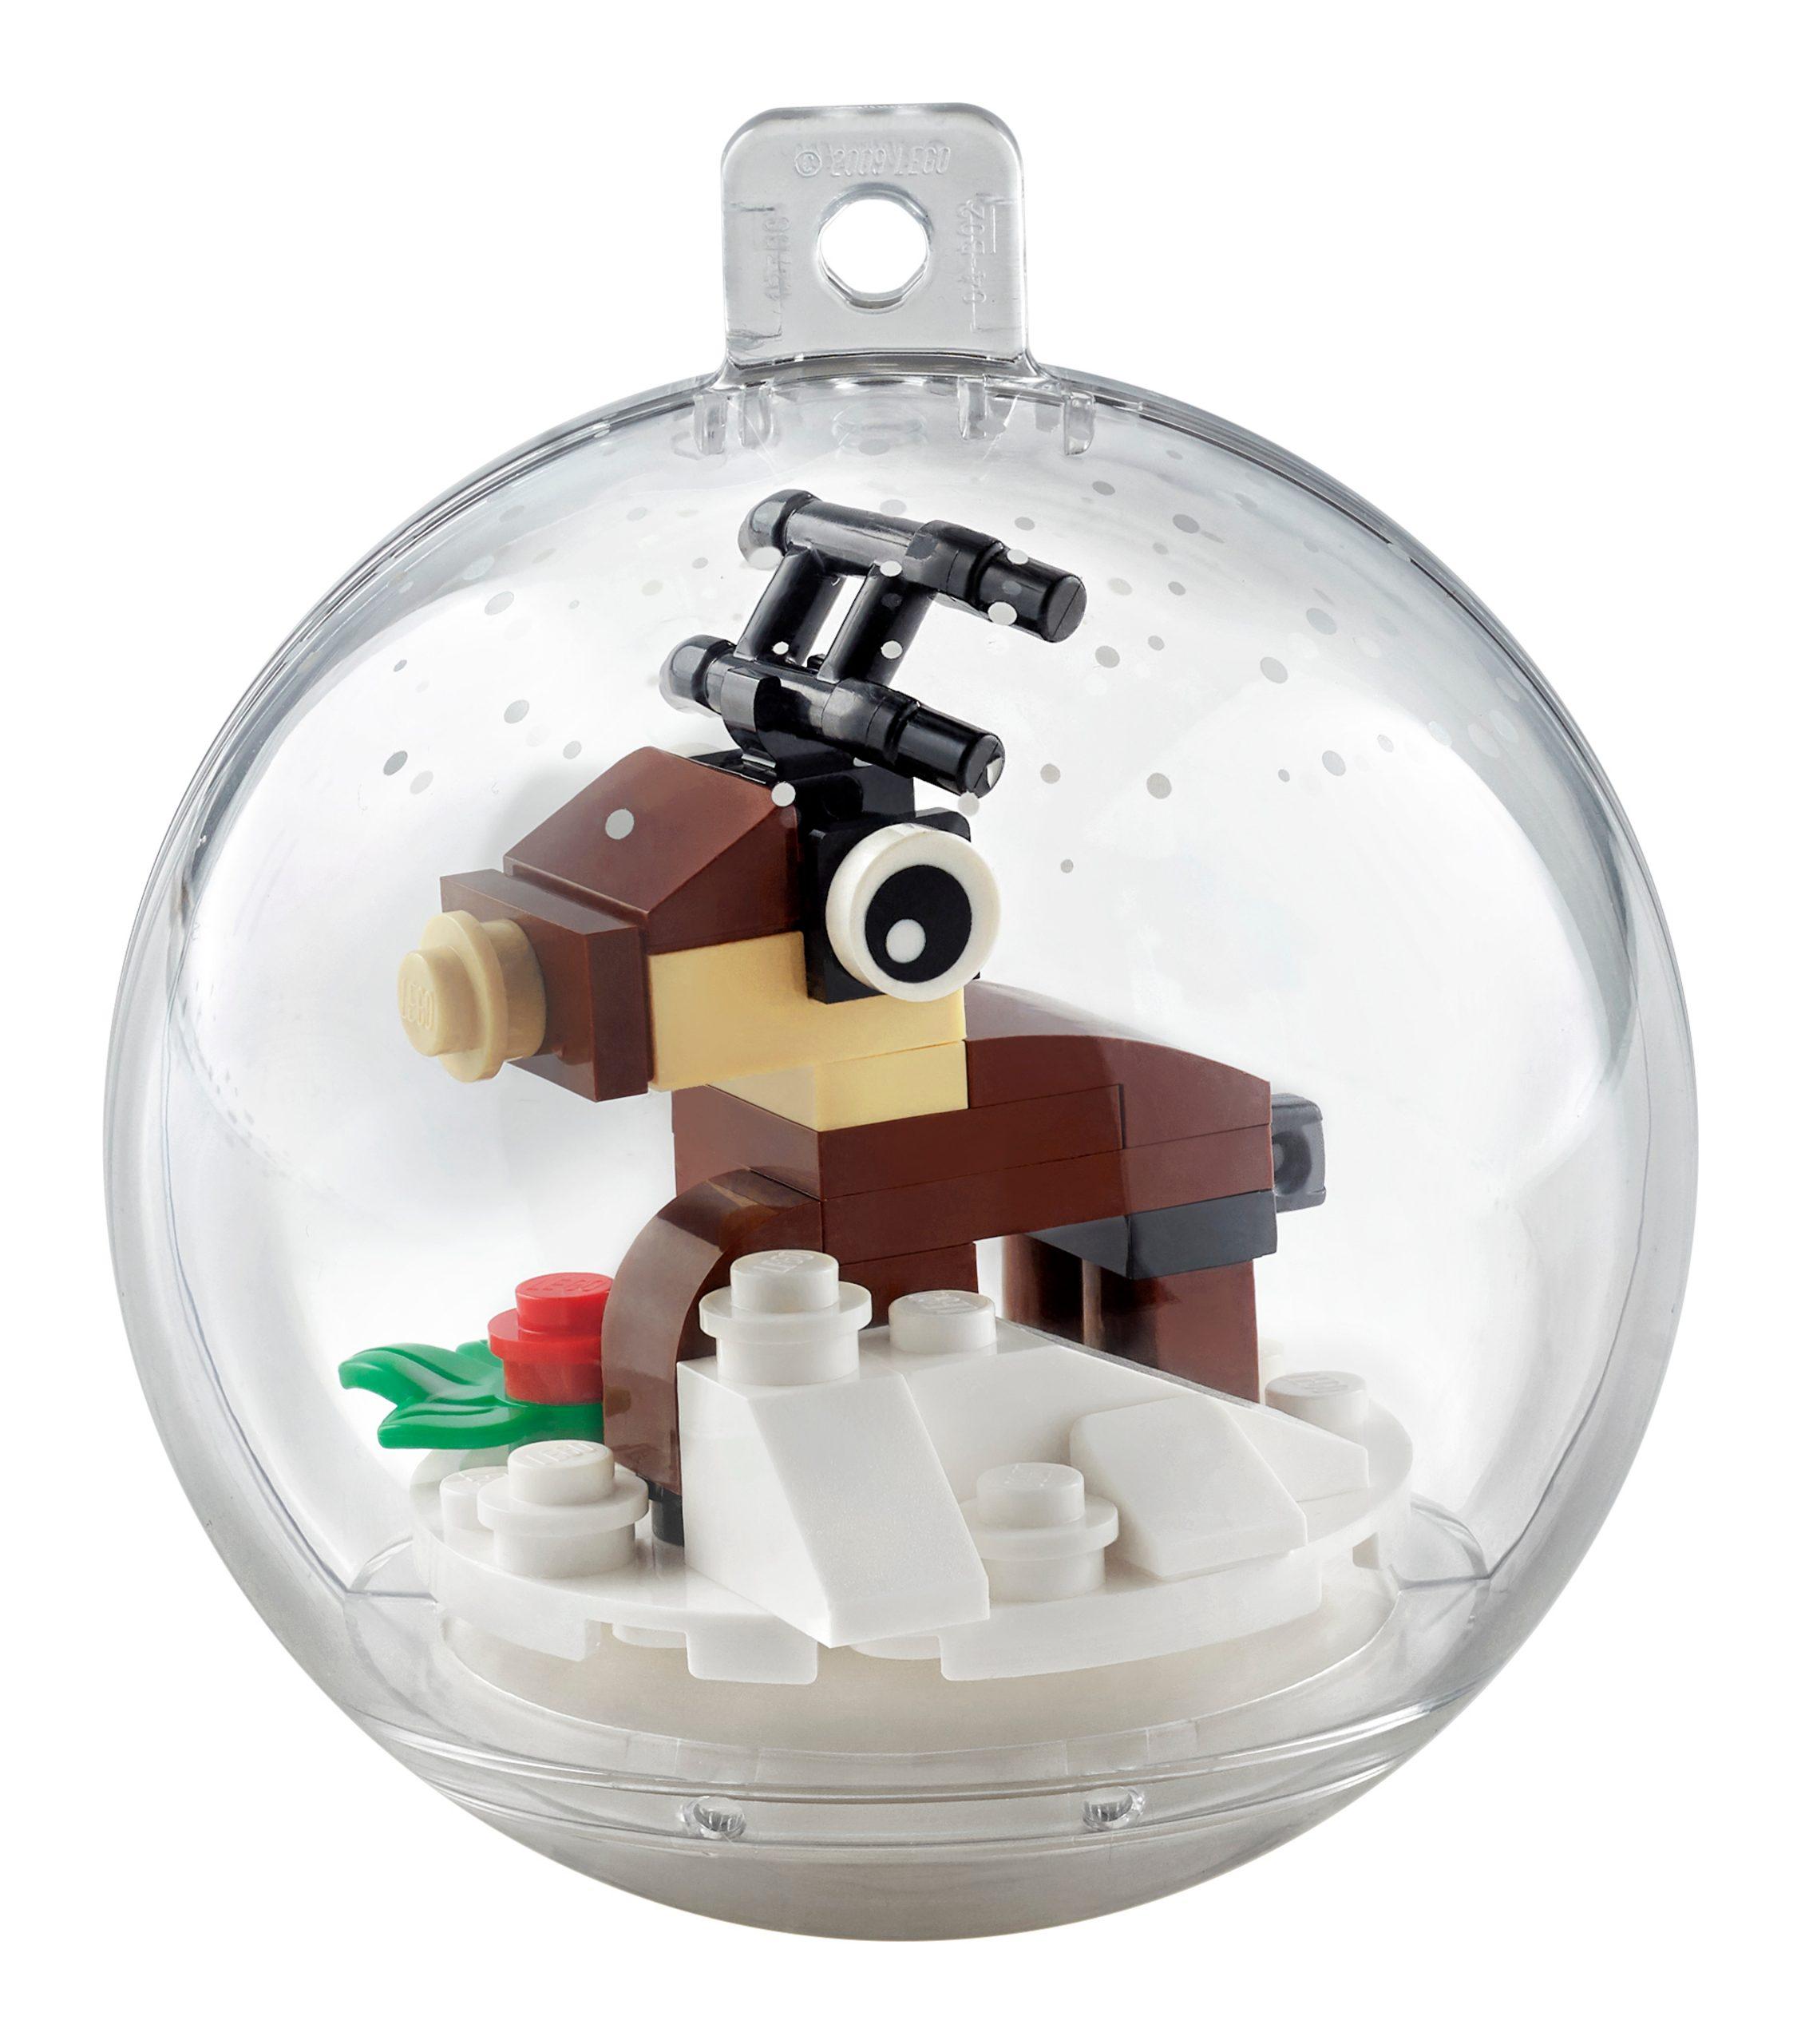 lego 854038 christmas ornament reindeer scaled